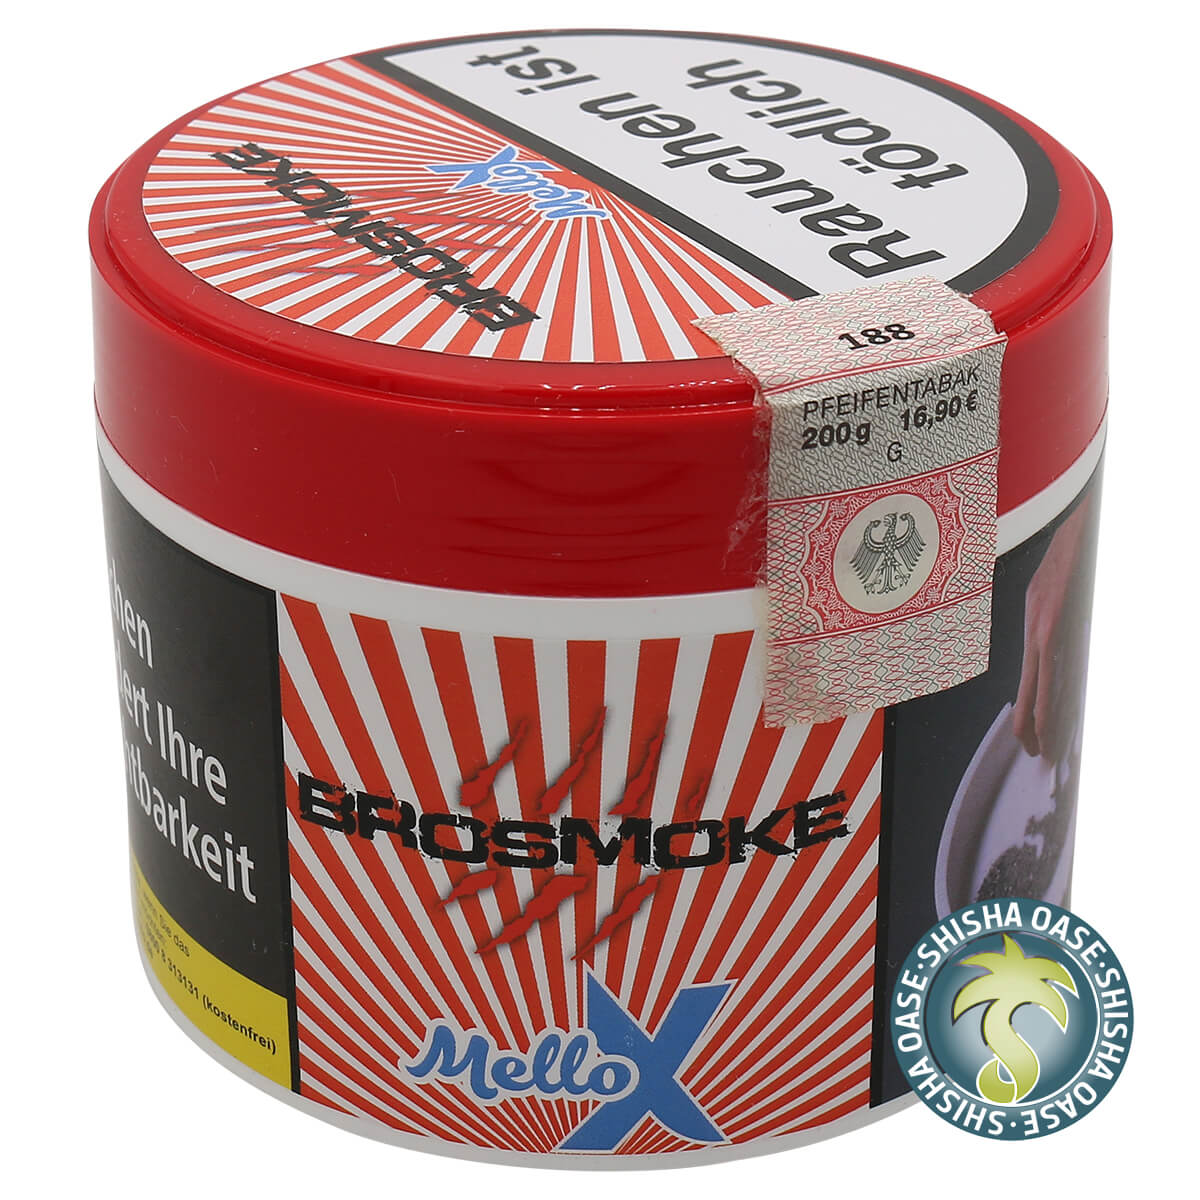 Brosmoke Tabak 200g Dose | Mello X